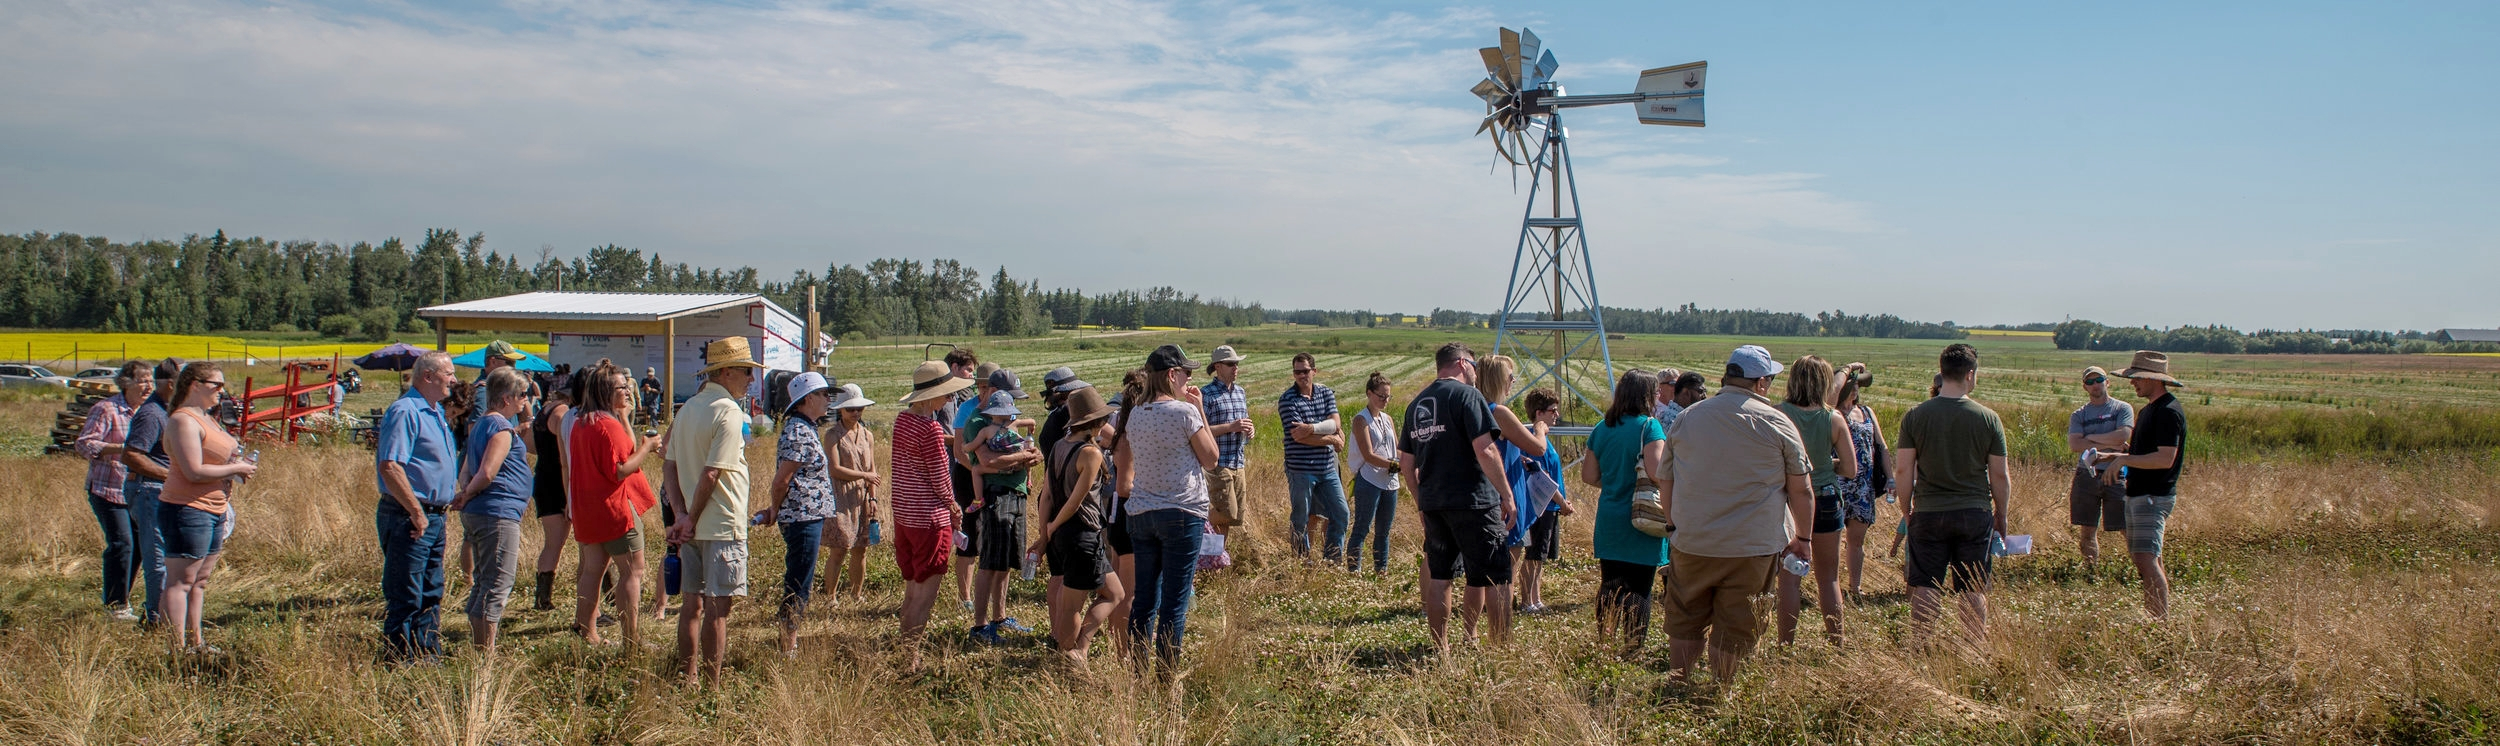 Rosy farms - haskap alberta - farm tour